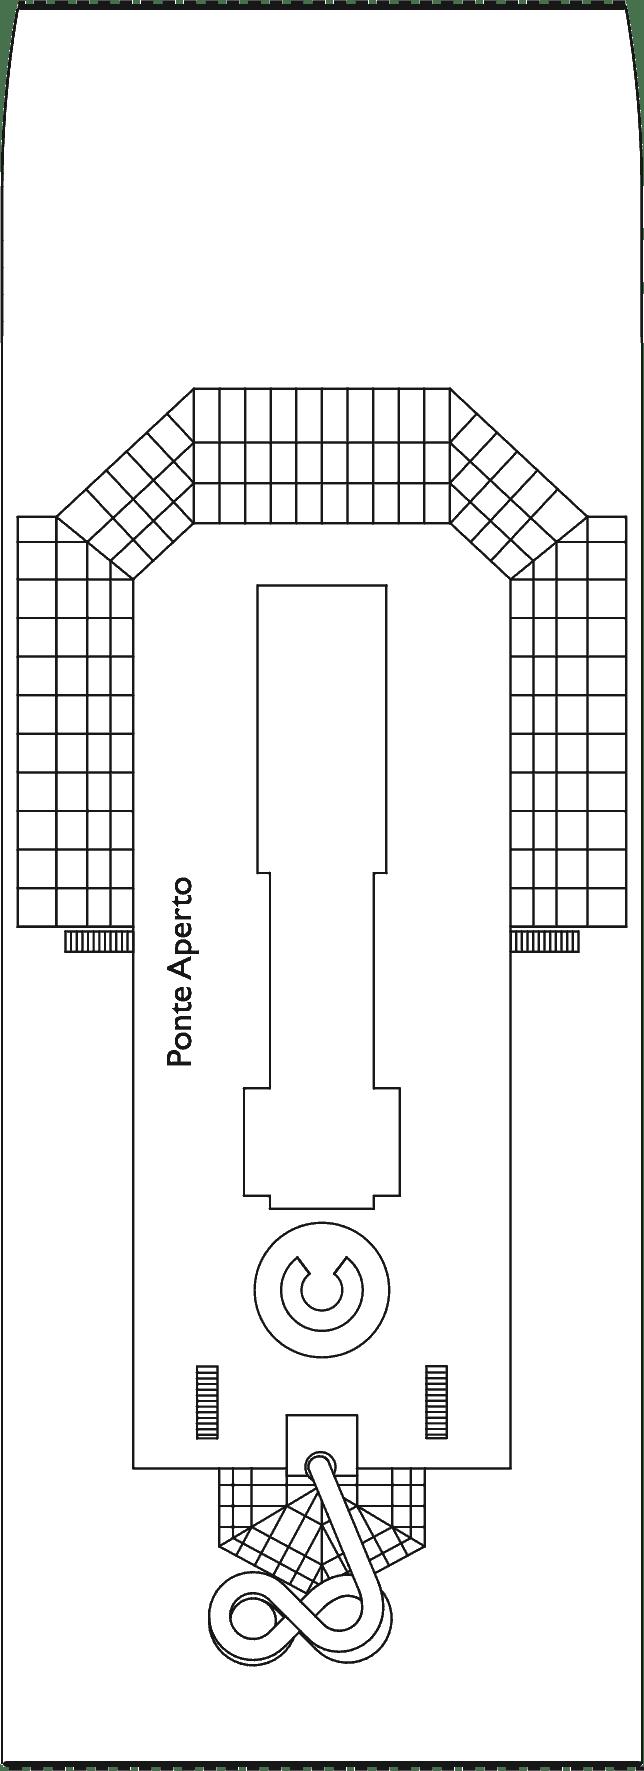 Deck 13